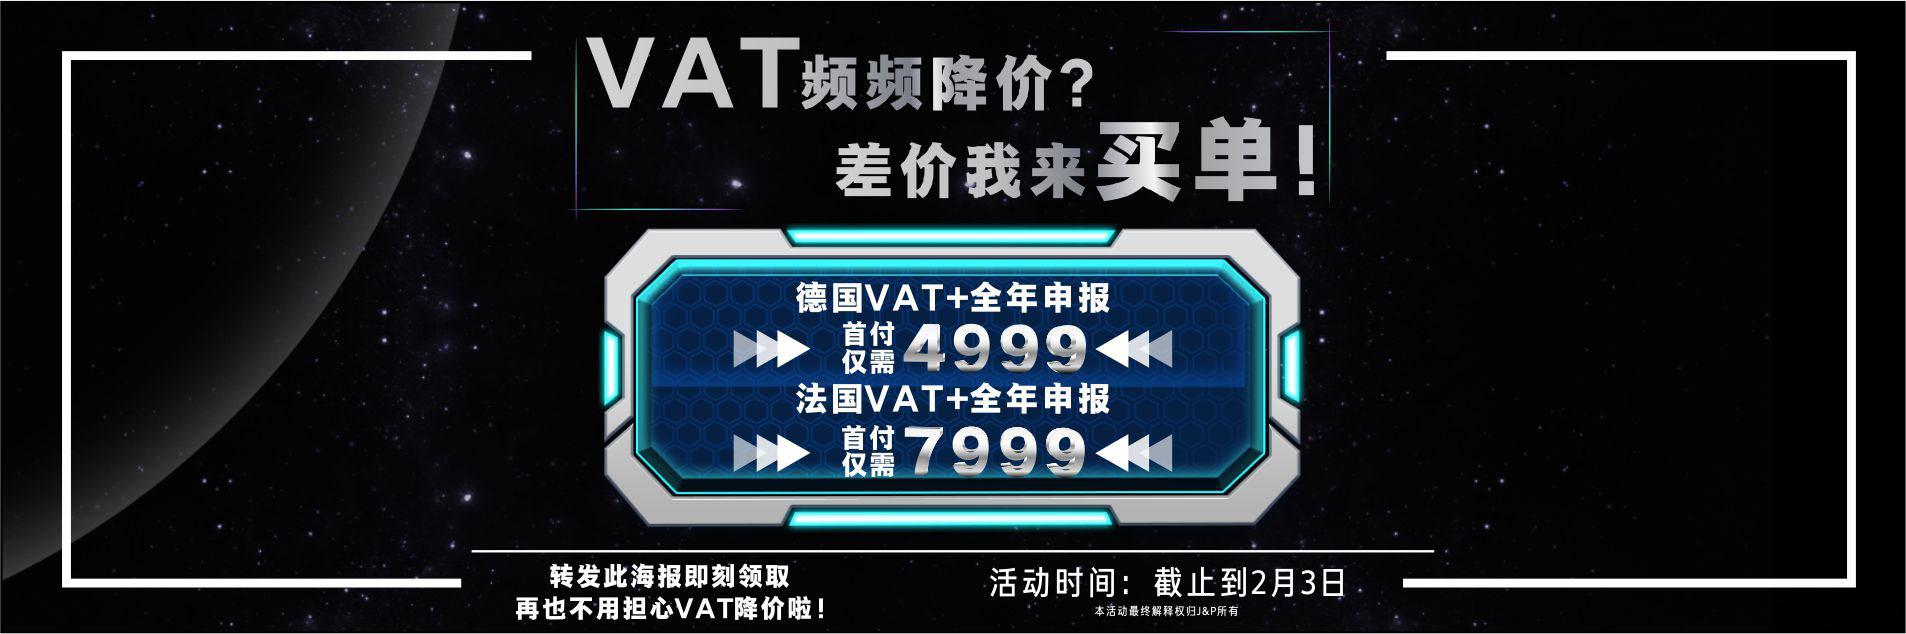 VAT频频降价,差价我来买单